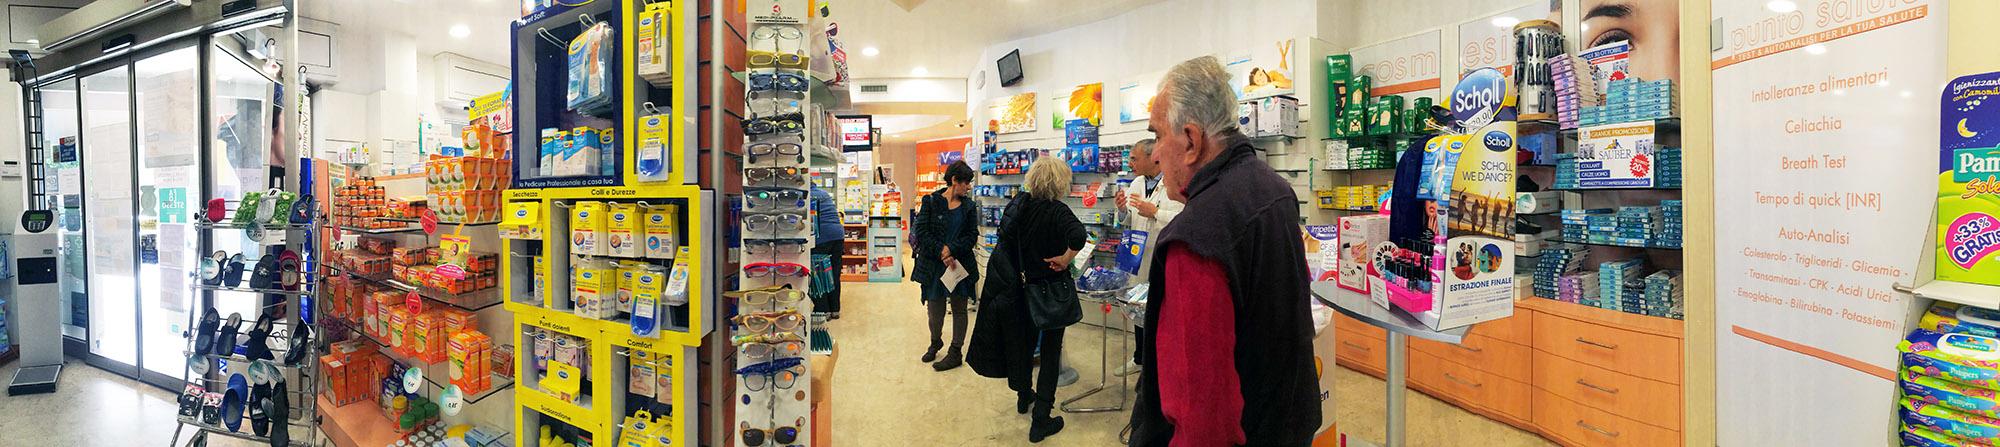 Farmacia Dagnino - Gallery